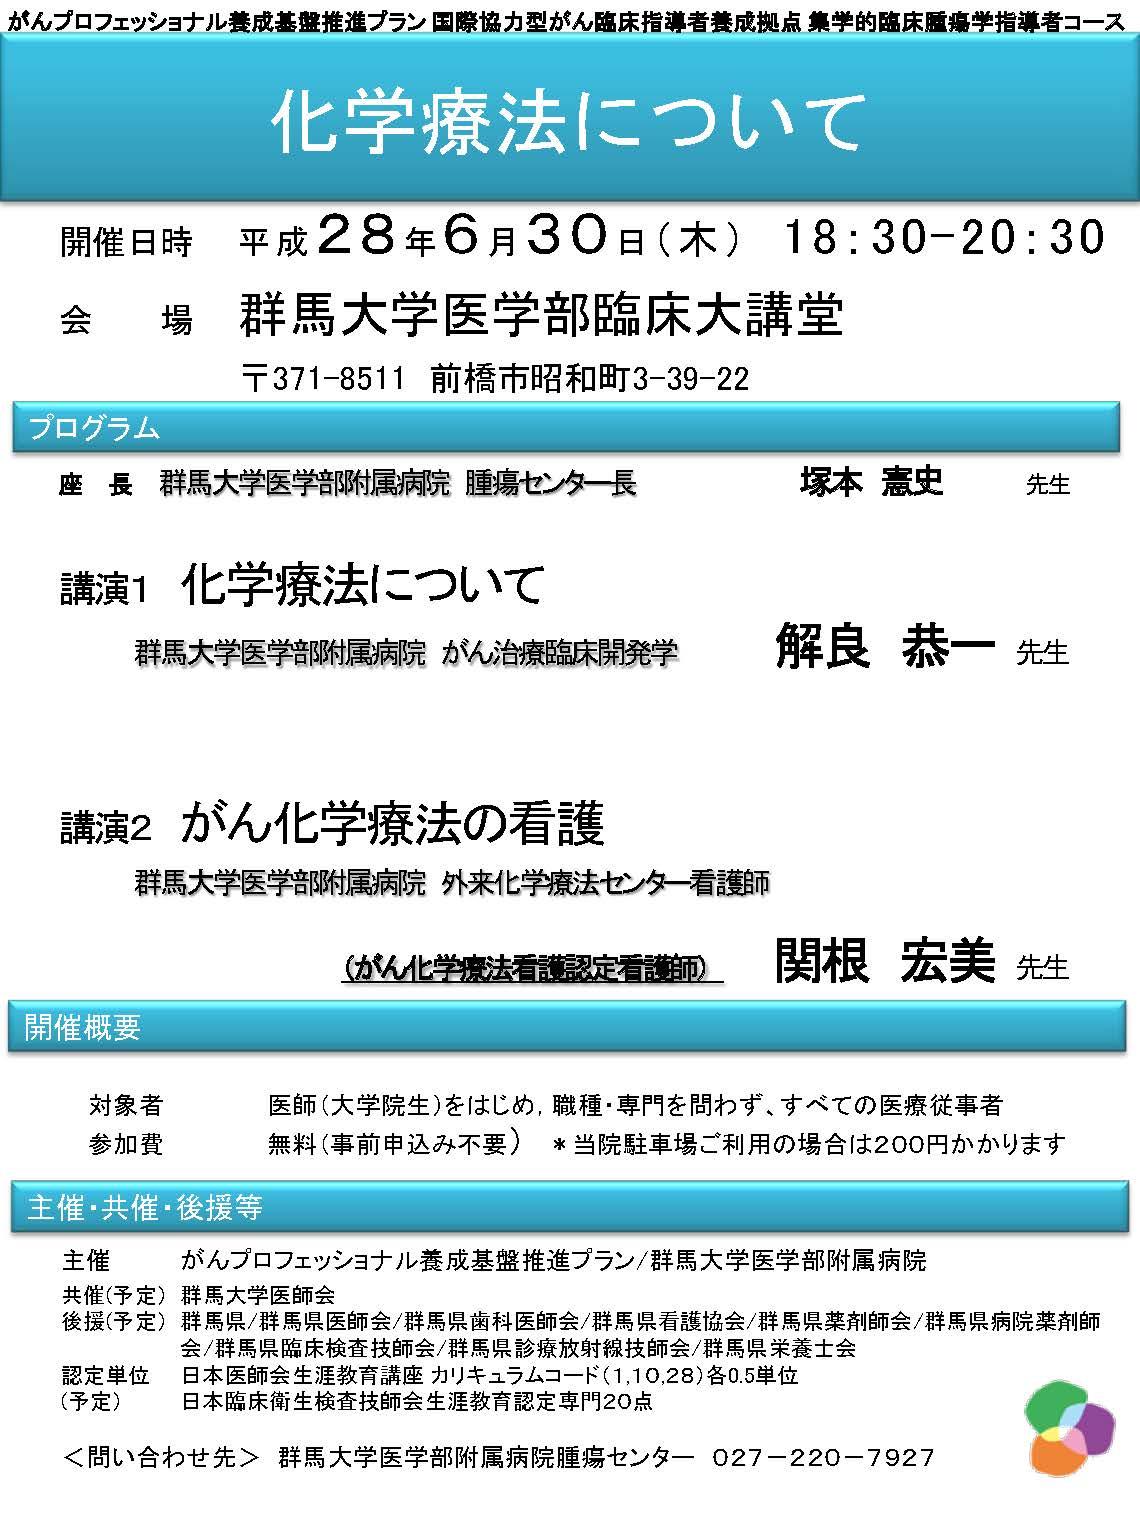 H27.11.12がん研修会ポスター画像(化学療法)